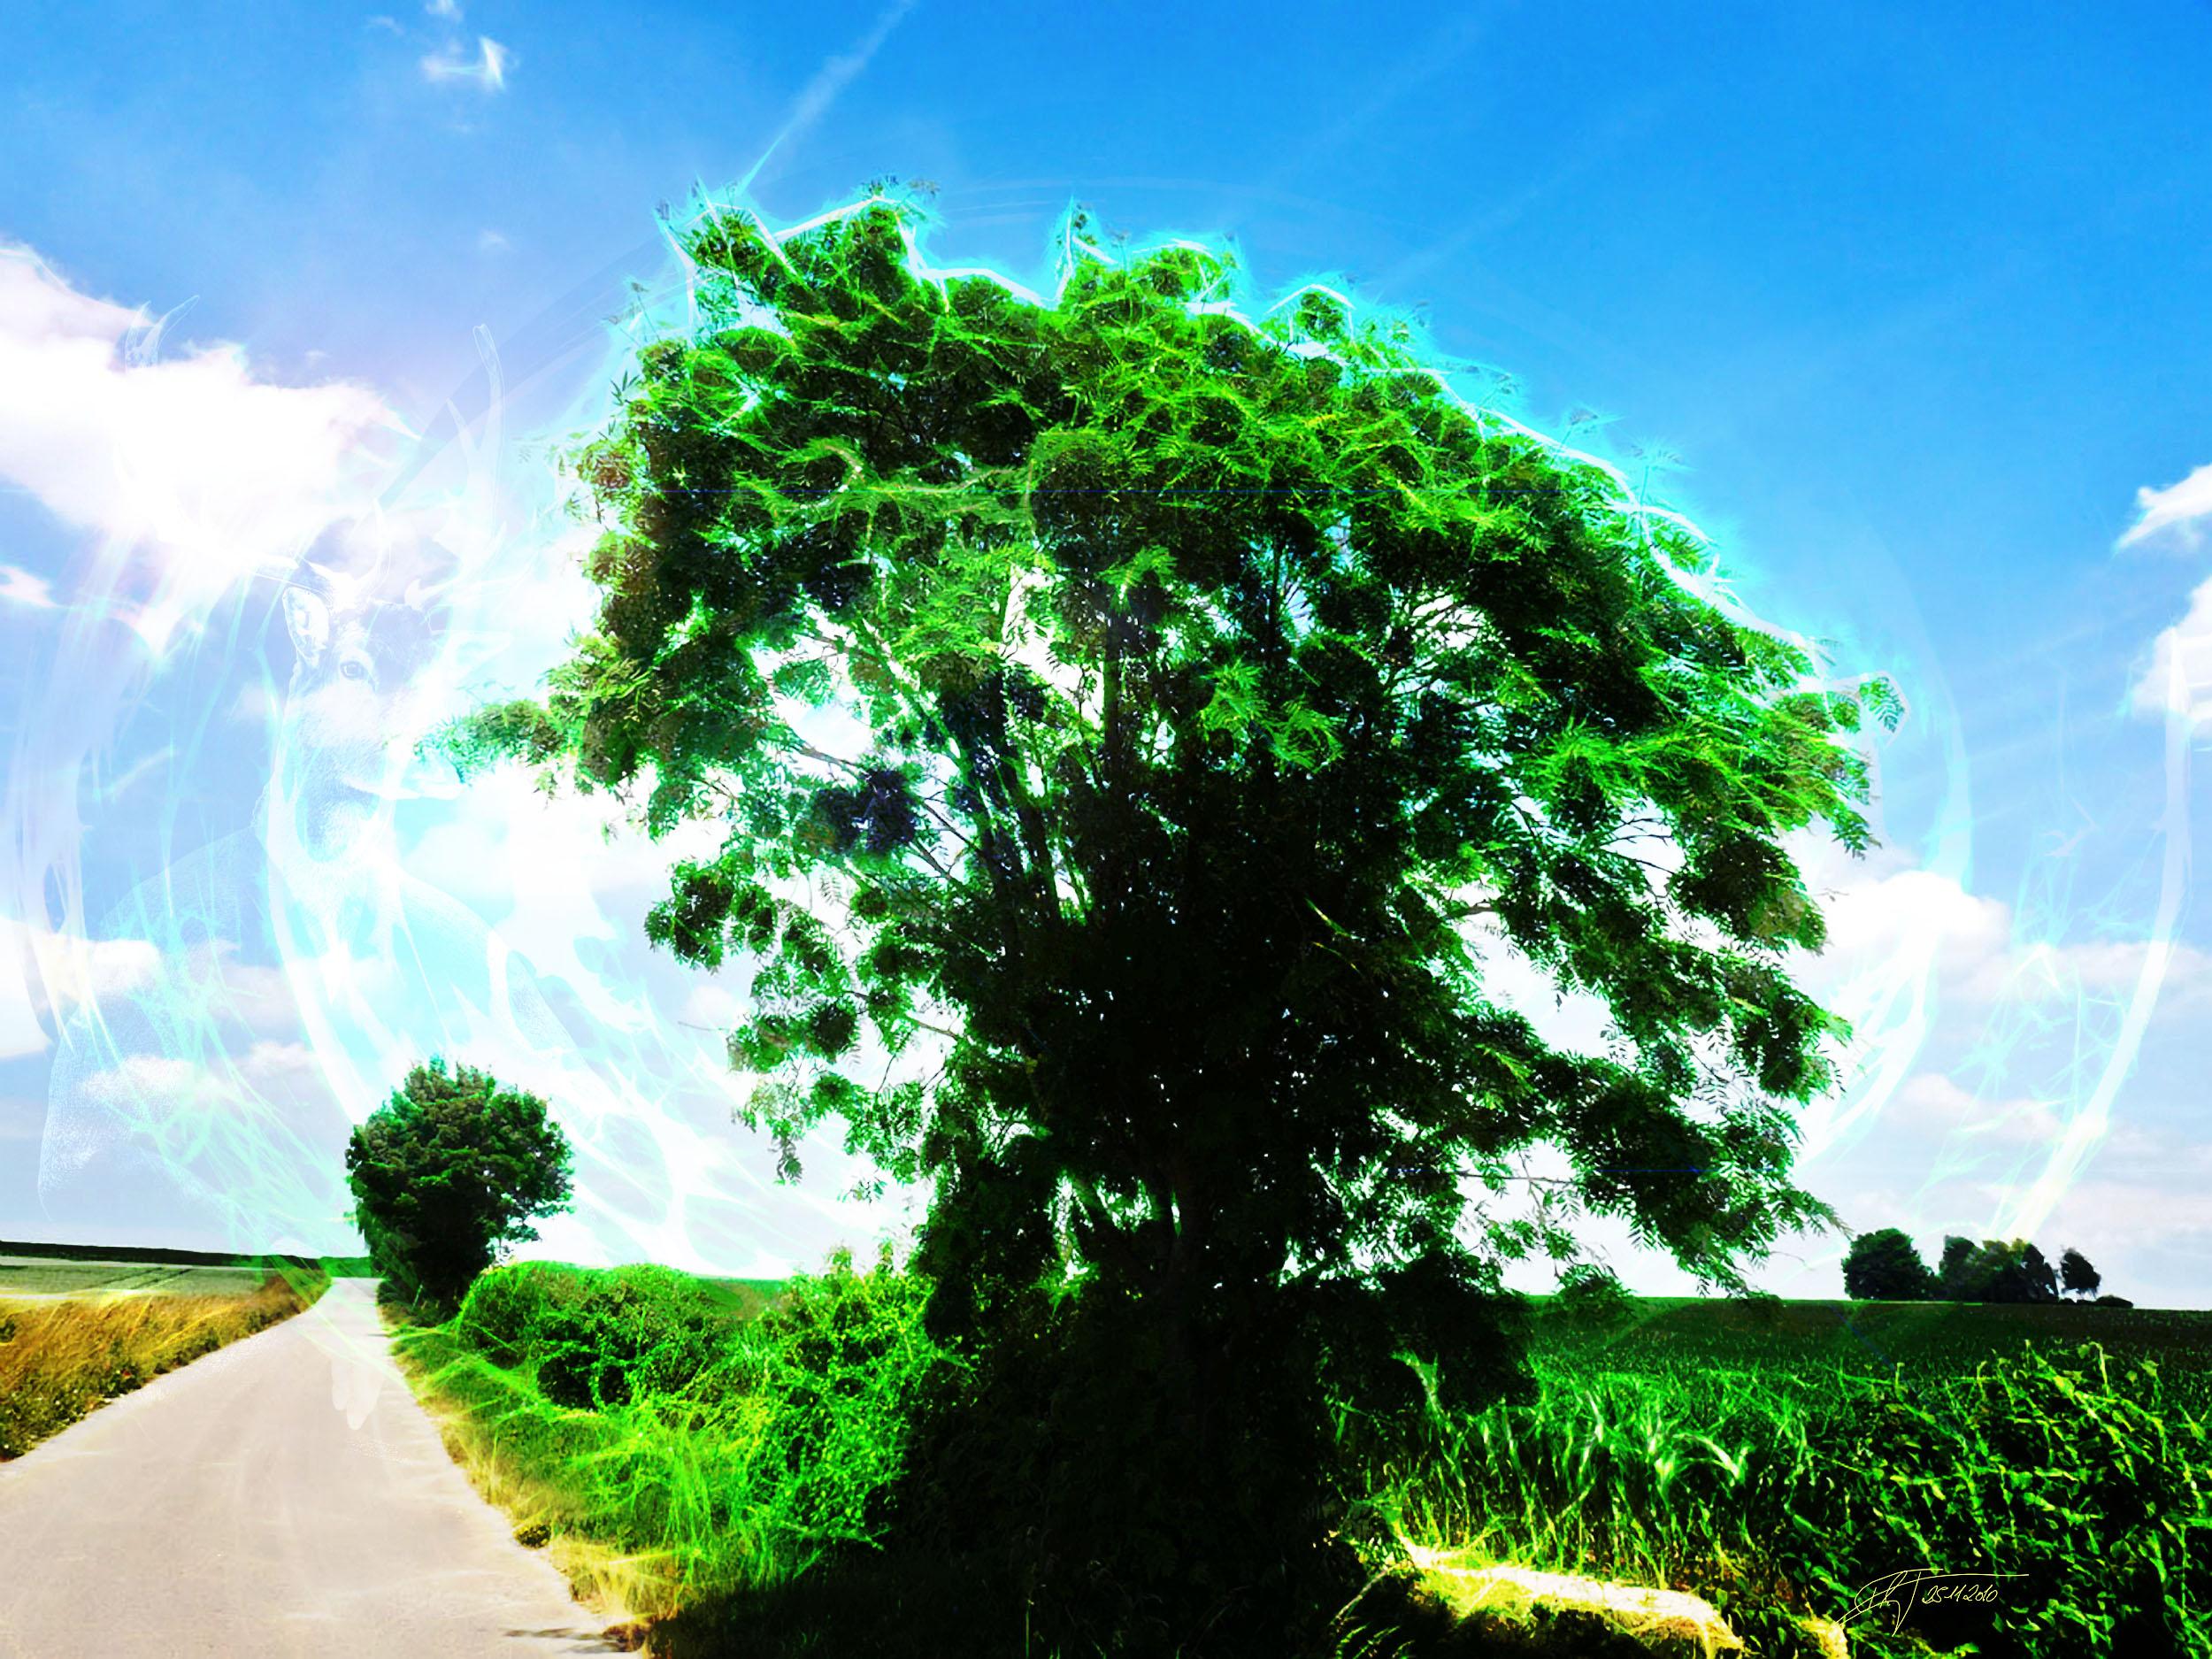 MWD 6; Contest; Tree; Dream; Soft; Sherical